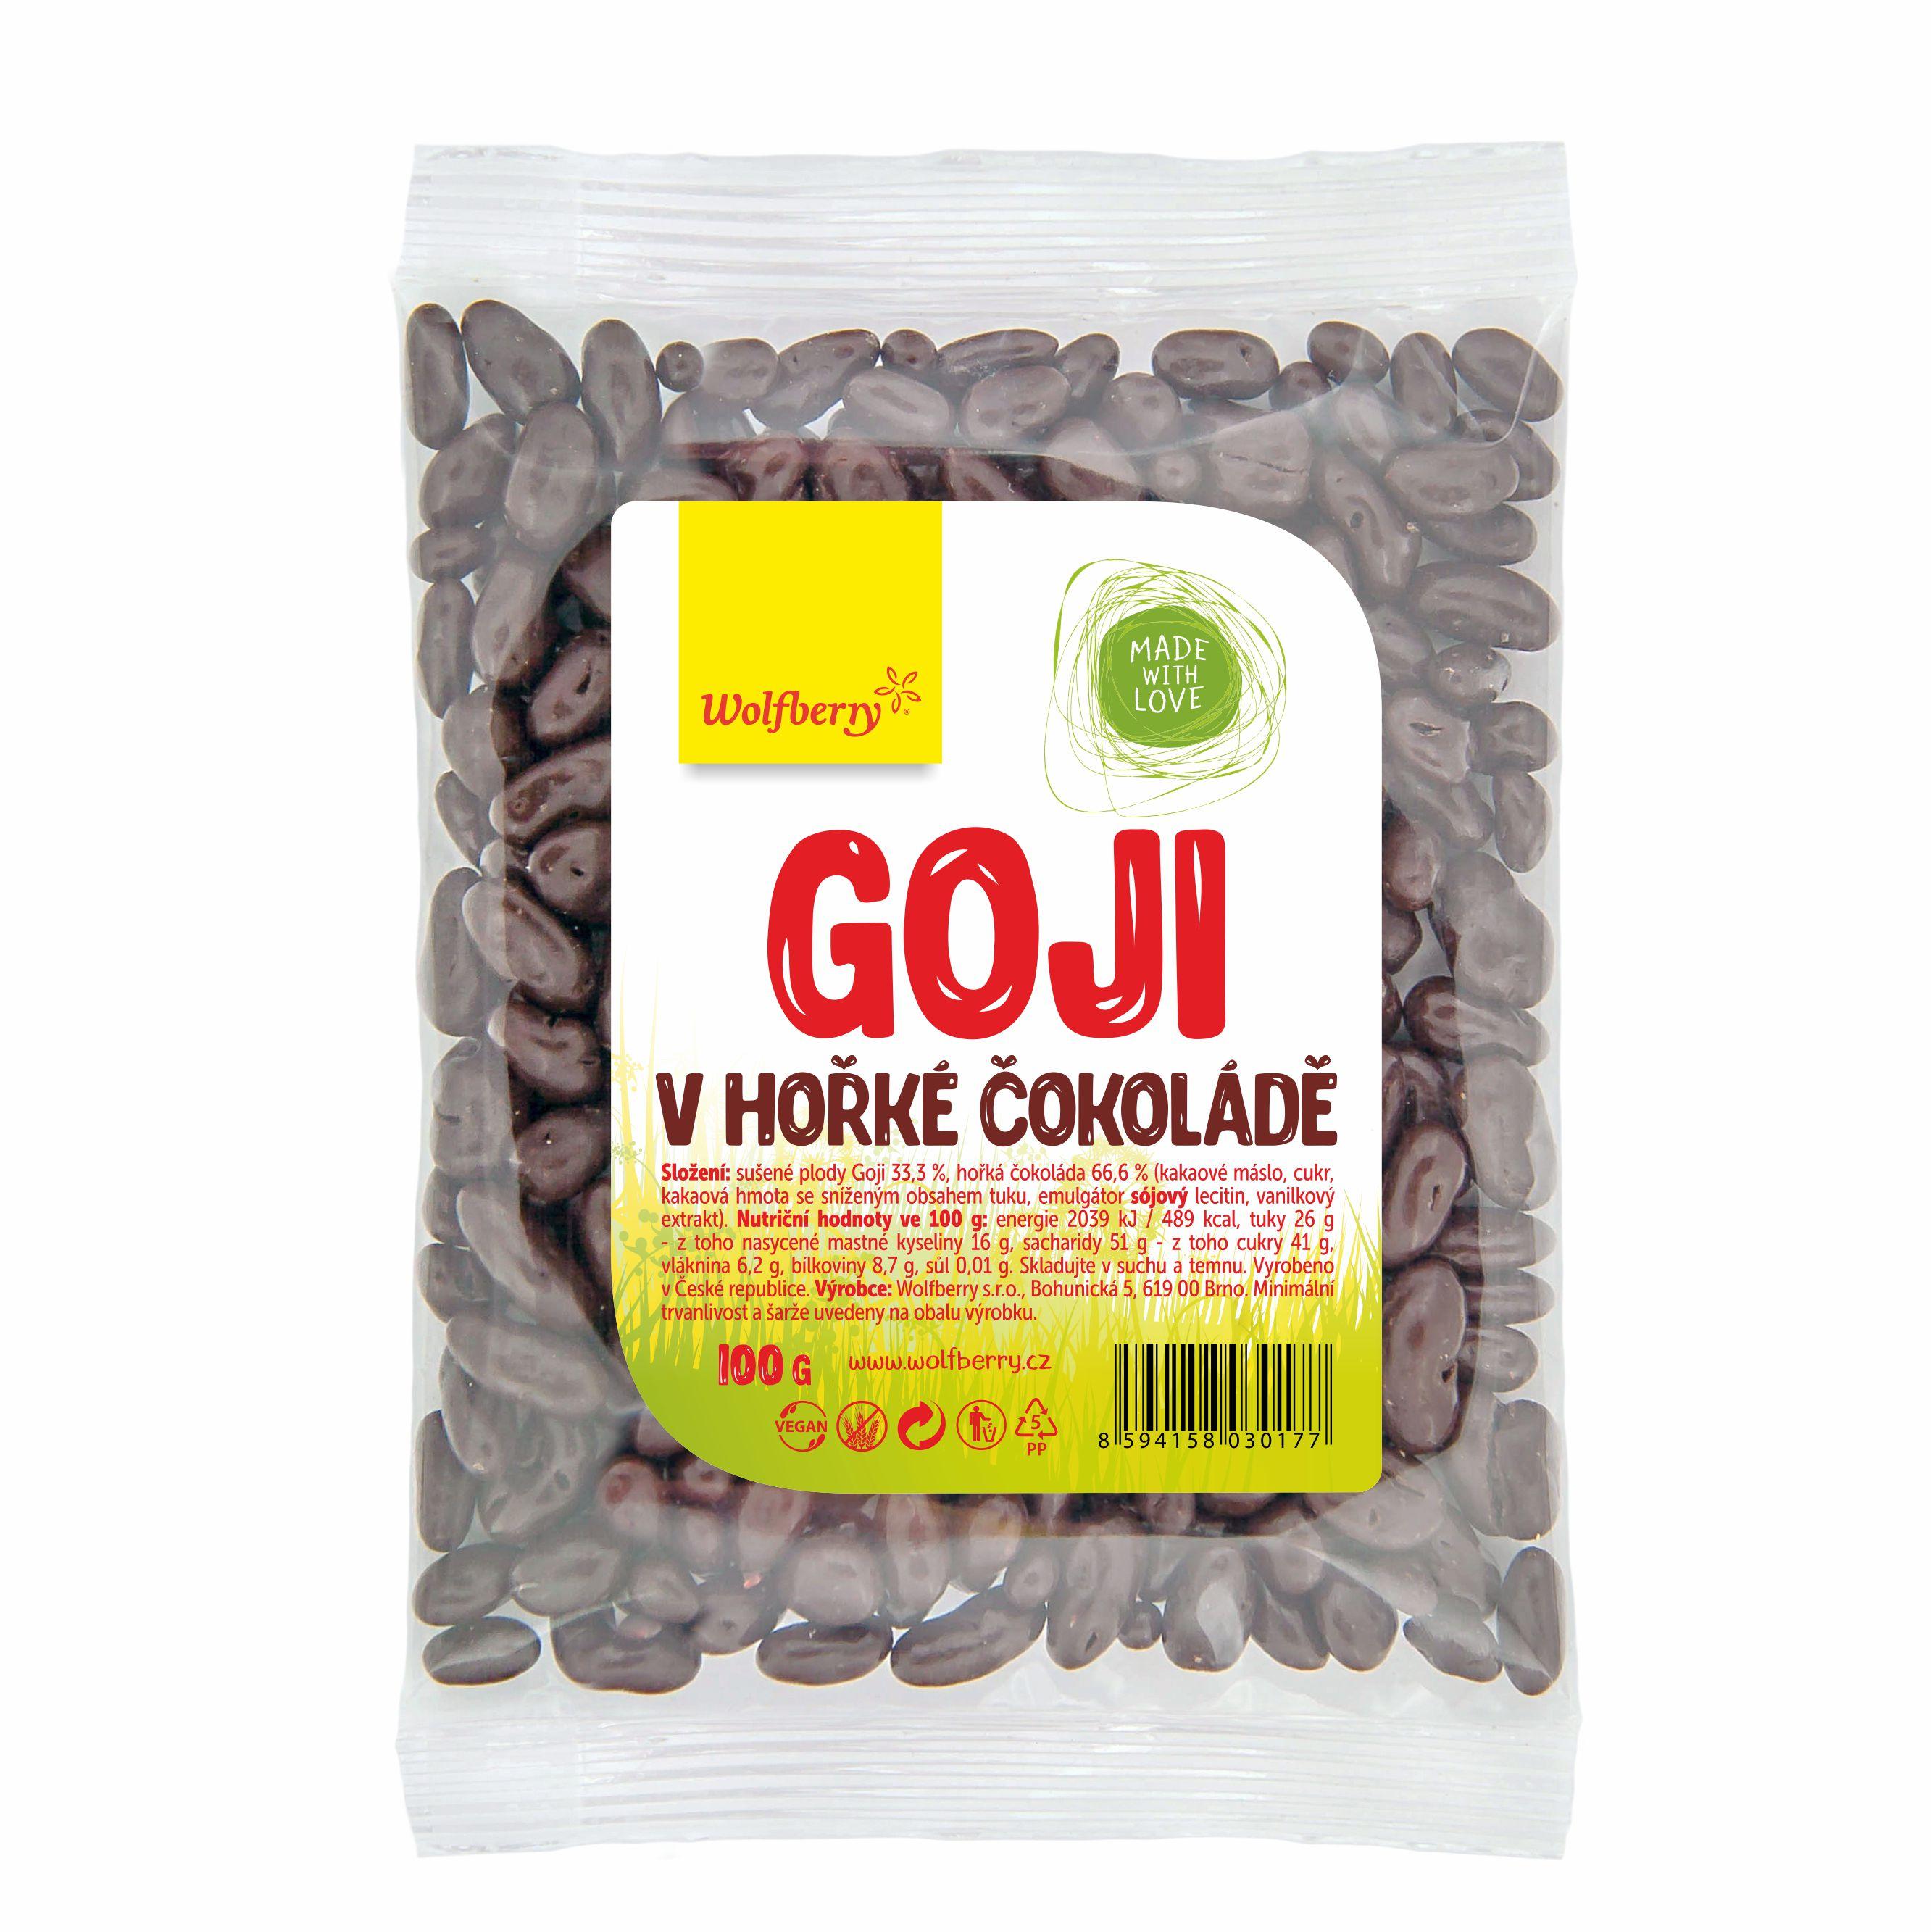 Wolfberry WF Goji v horkej čokoláde 100 g Wolfberry 100 g